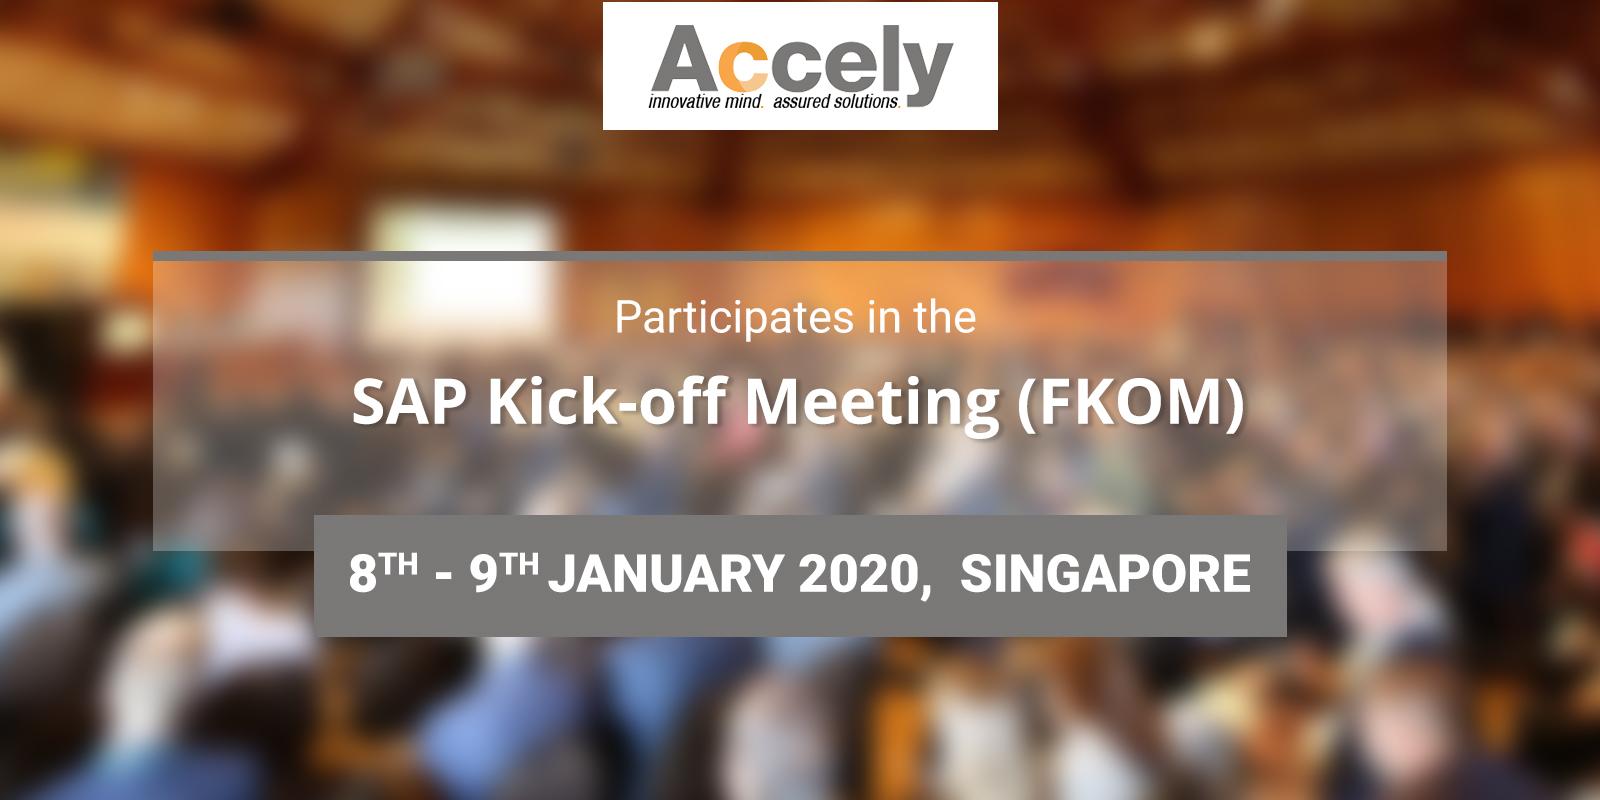 SAP Kick-off Meeting (FKOM) 2020 in Singapore